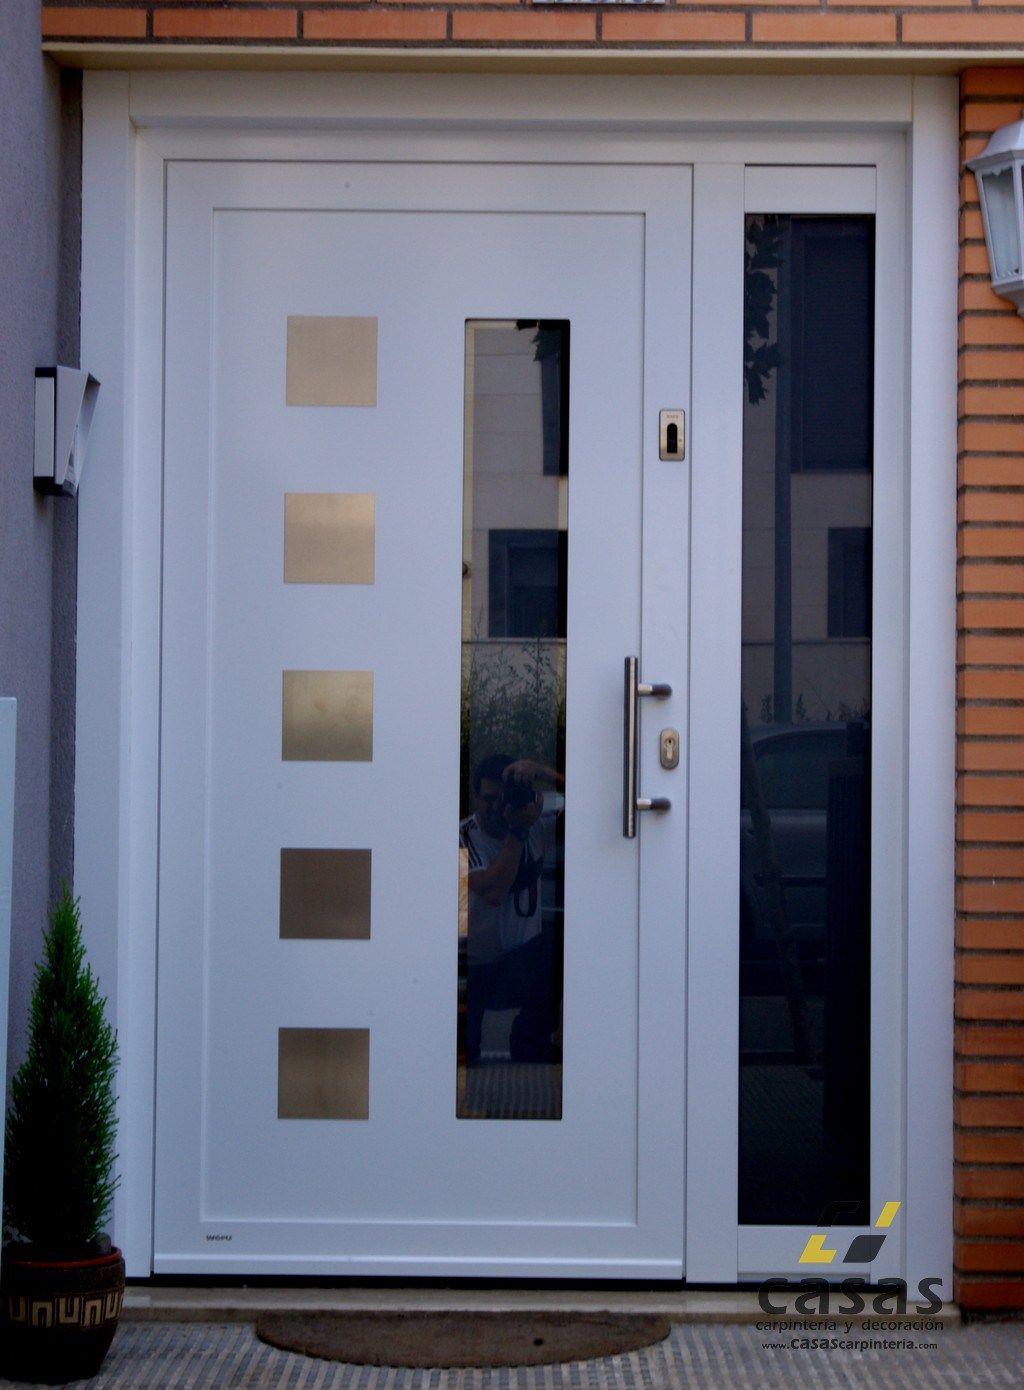 Imgp6633 Jpg 1024 1390 Puertas De Aluminio Modernas Puertas De Entrada Aluminio Puertas De Aluminio Exterior